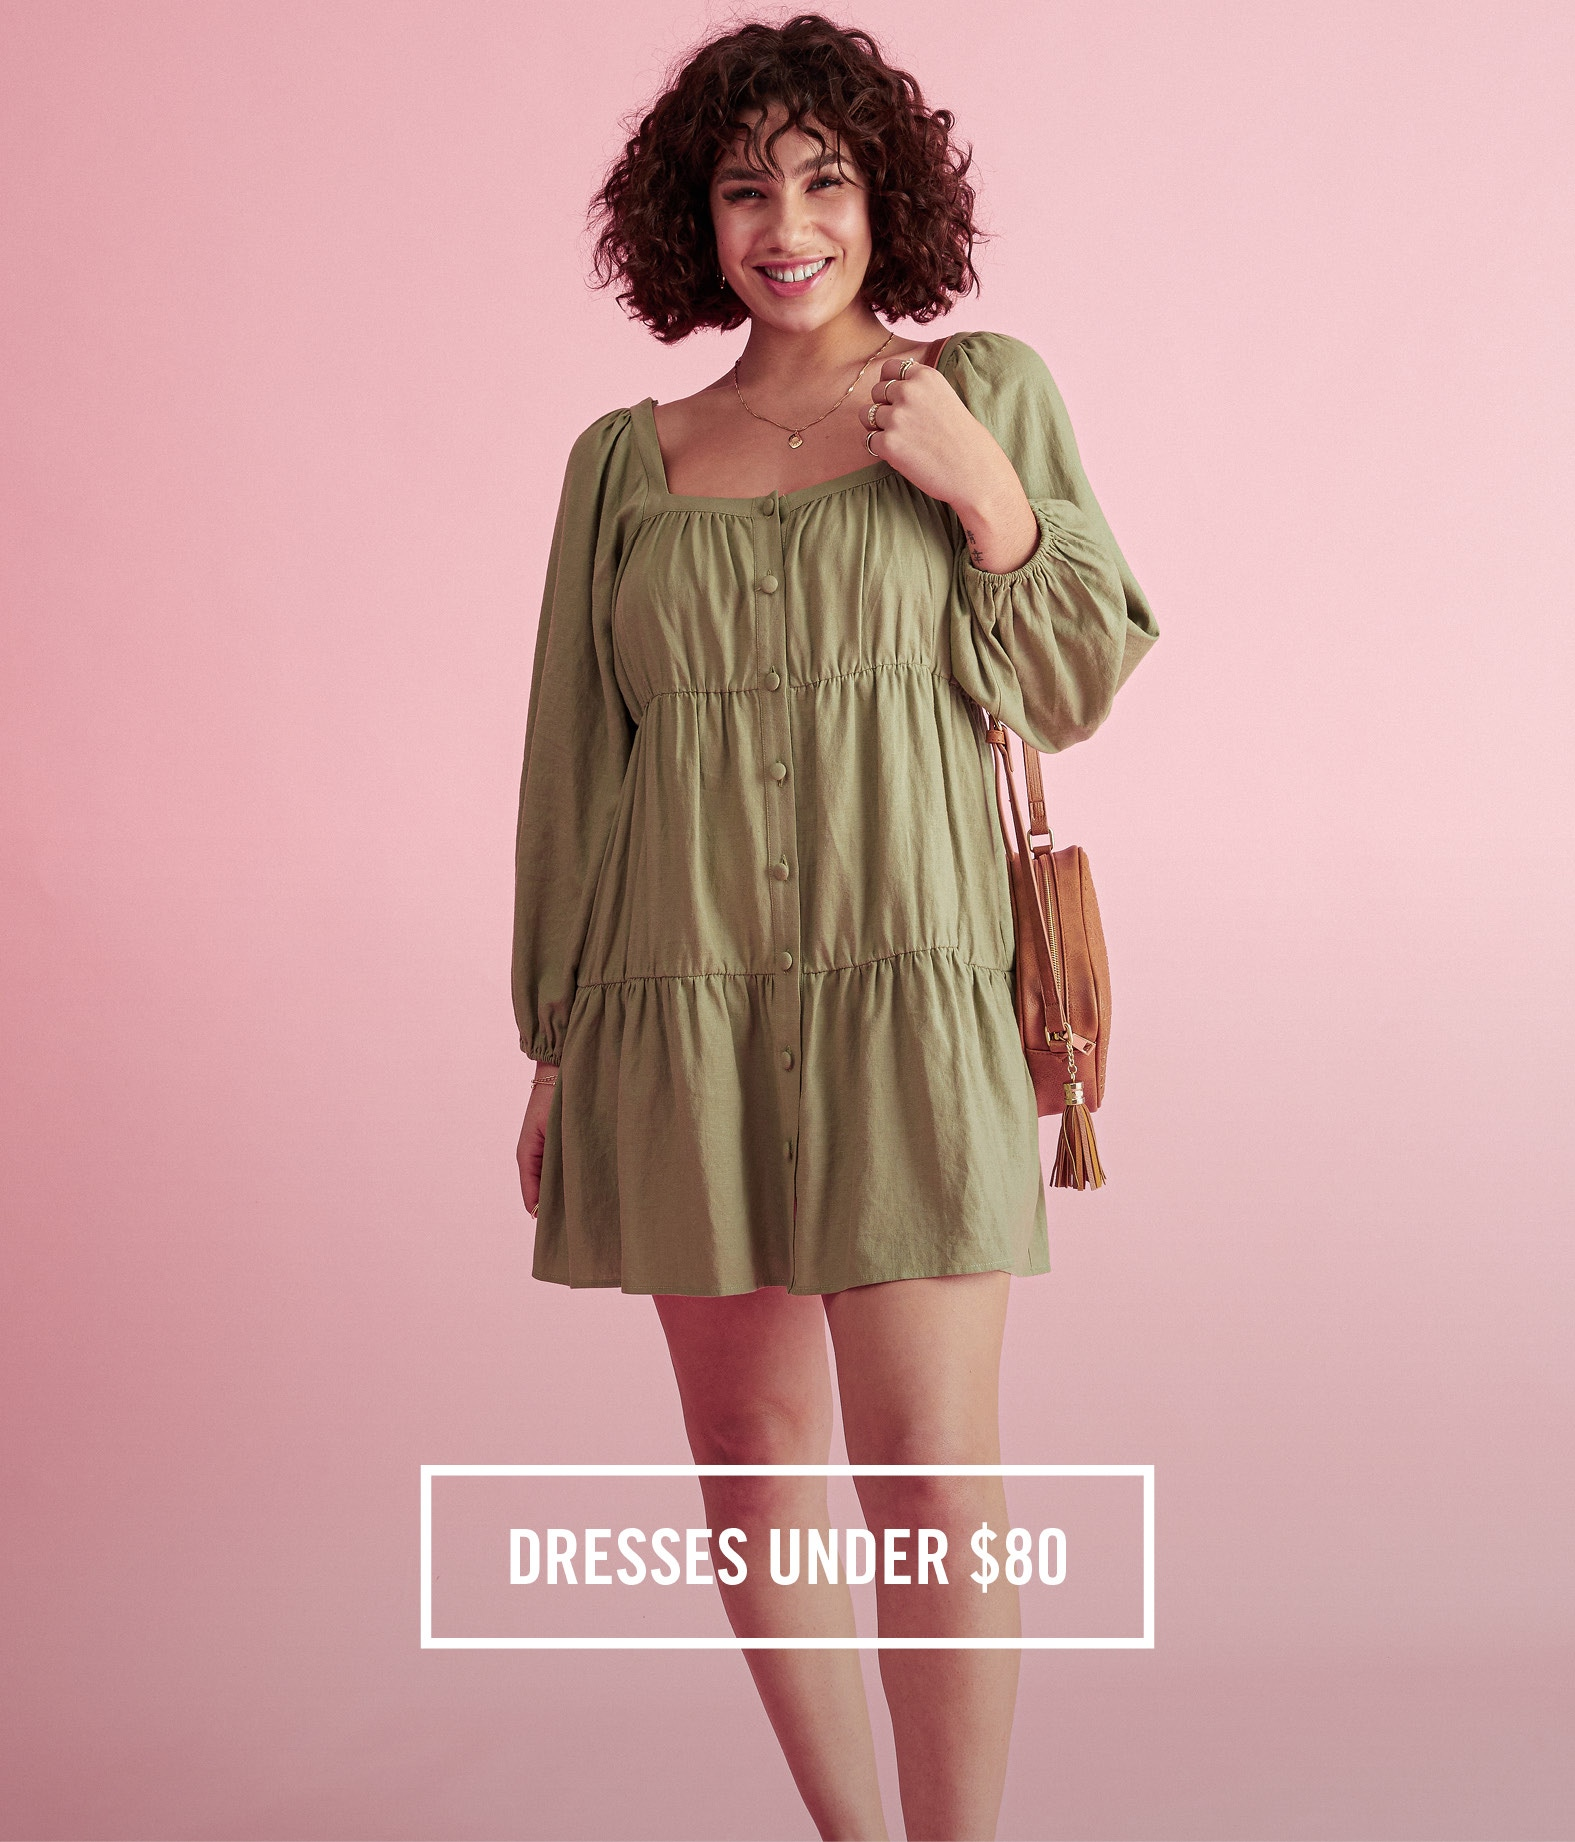 Dresses Under $80